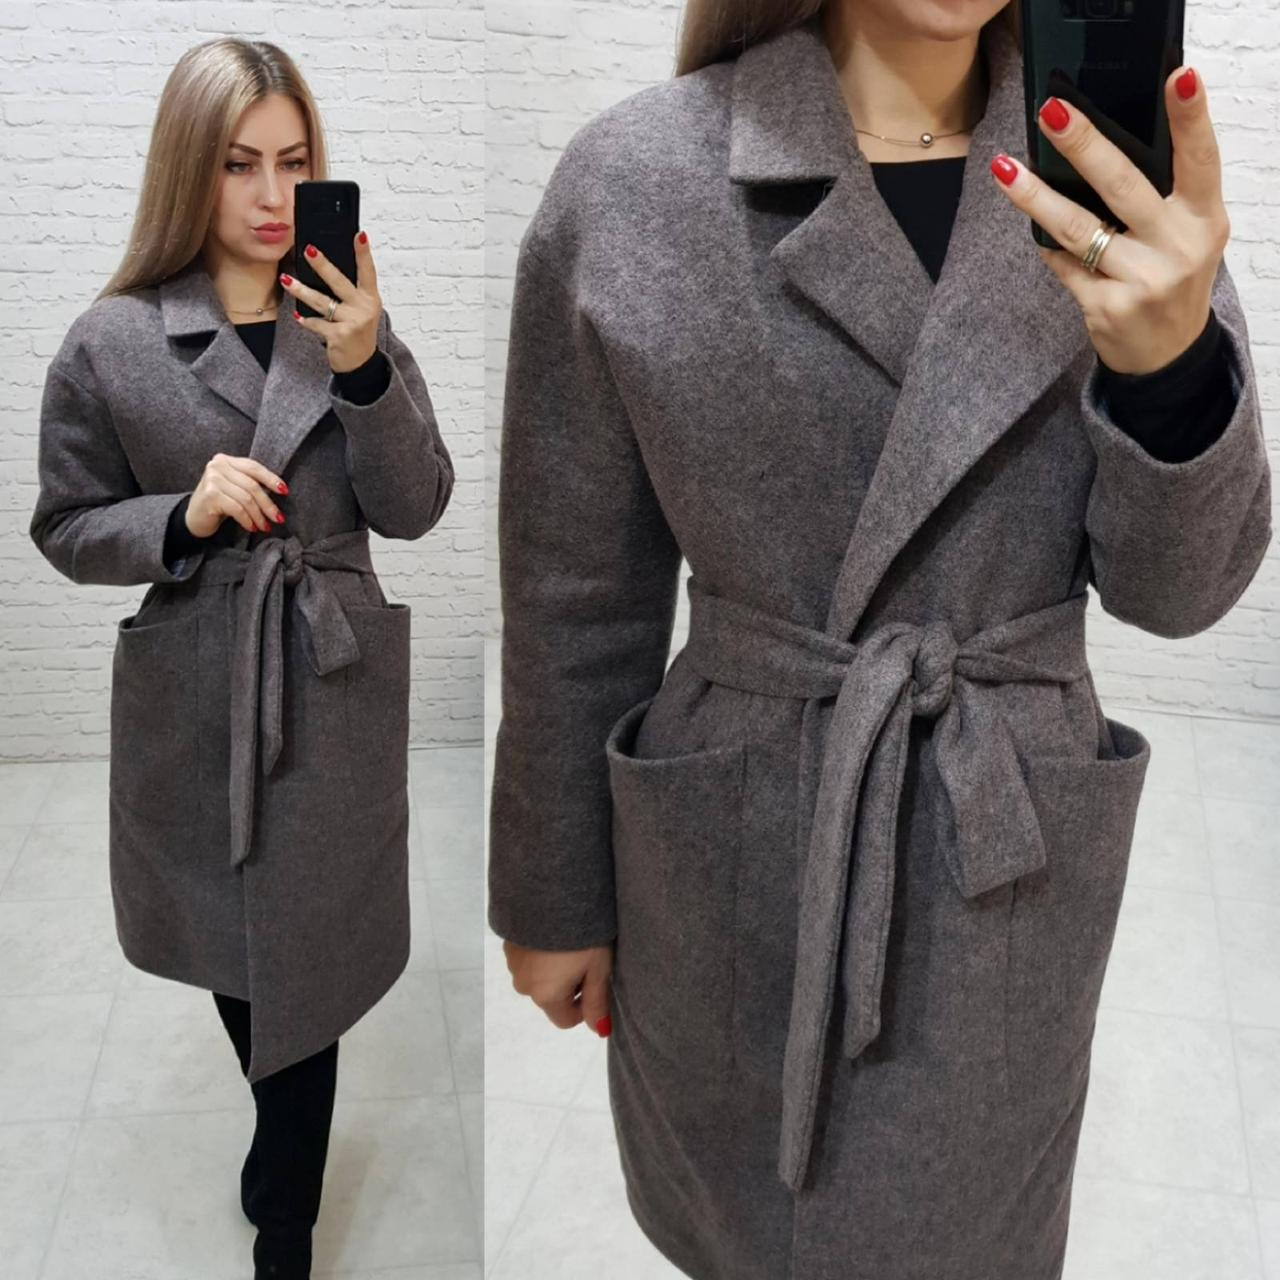 Утеплённое кашемировое пальто на запах с карманами,арт 175, цвет тёмно серый с розовым (6)